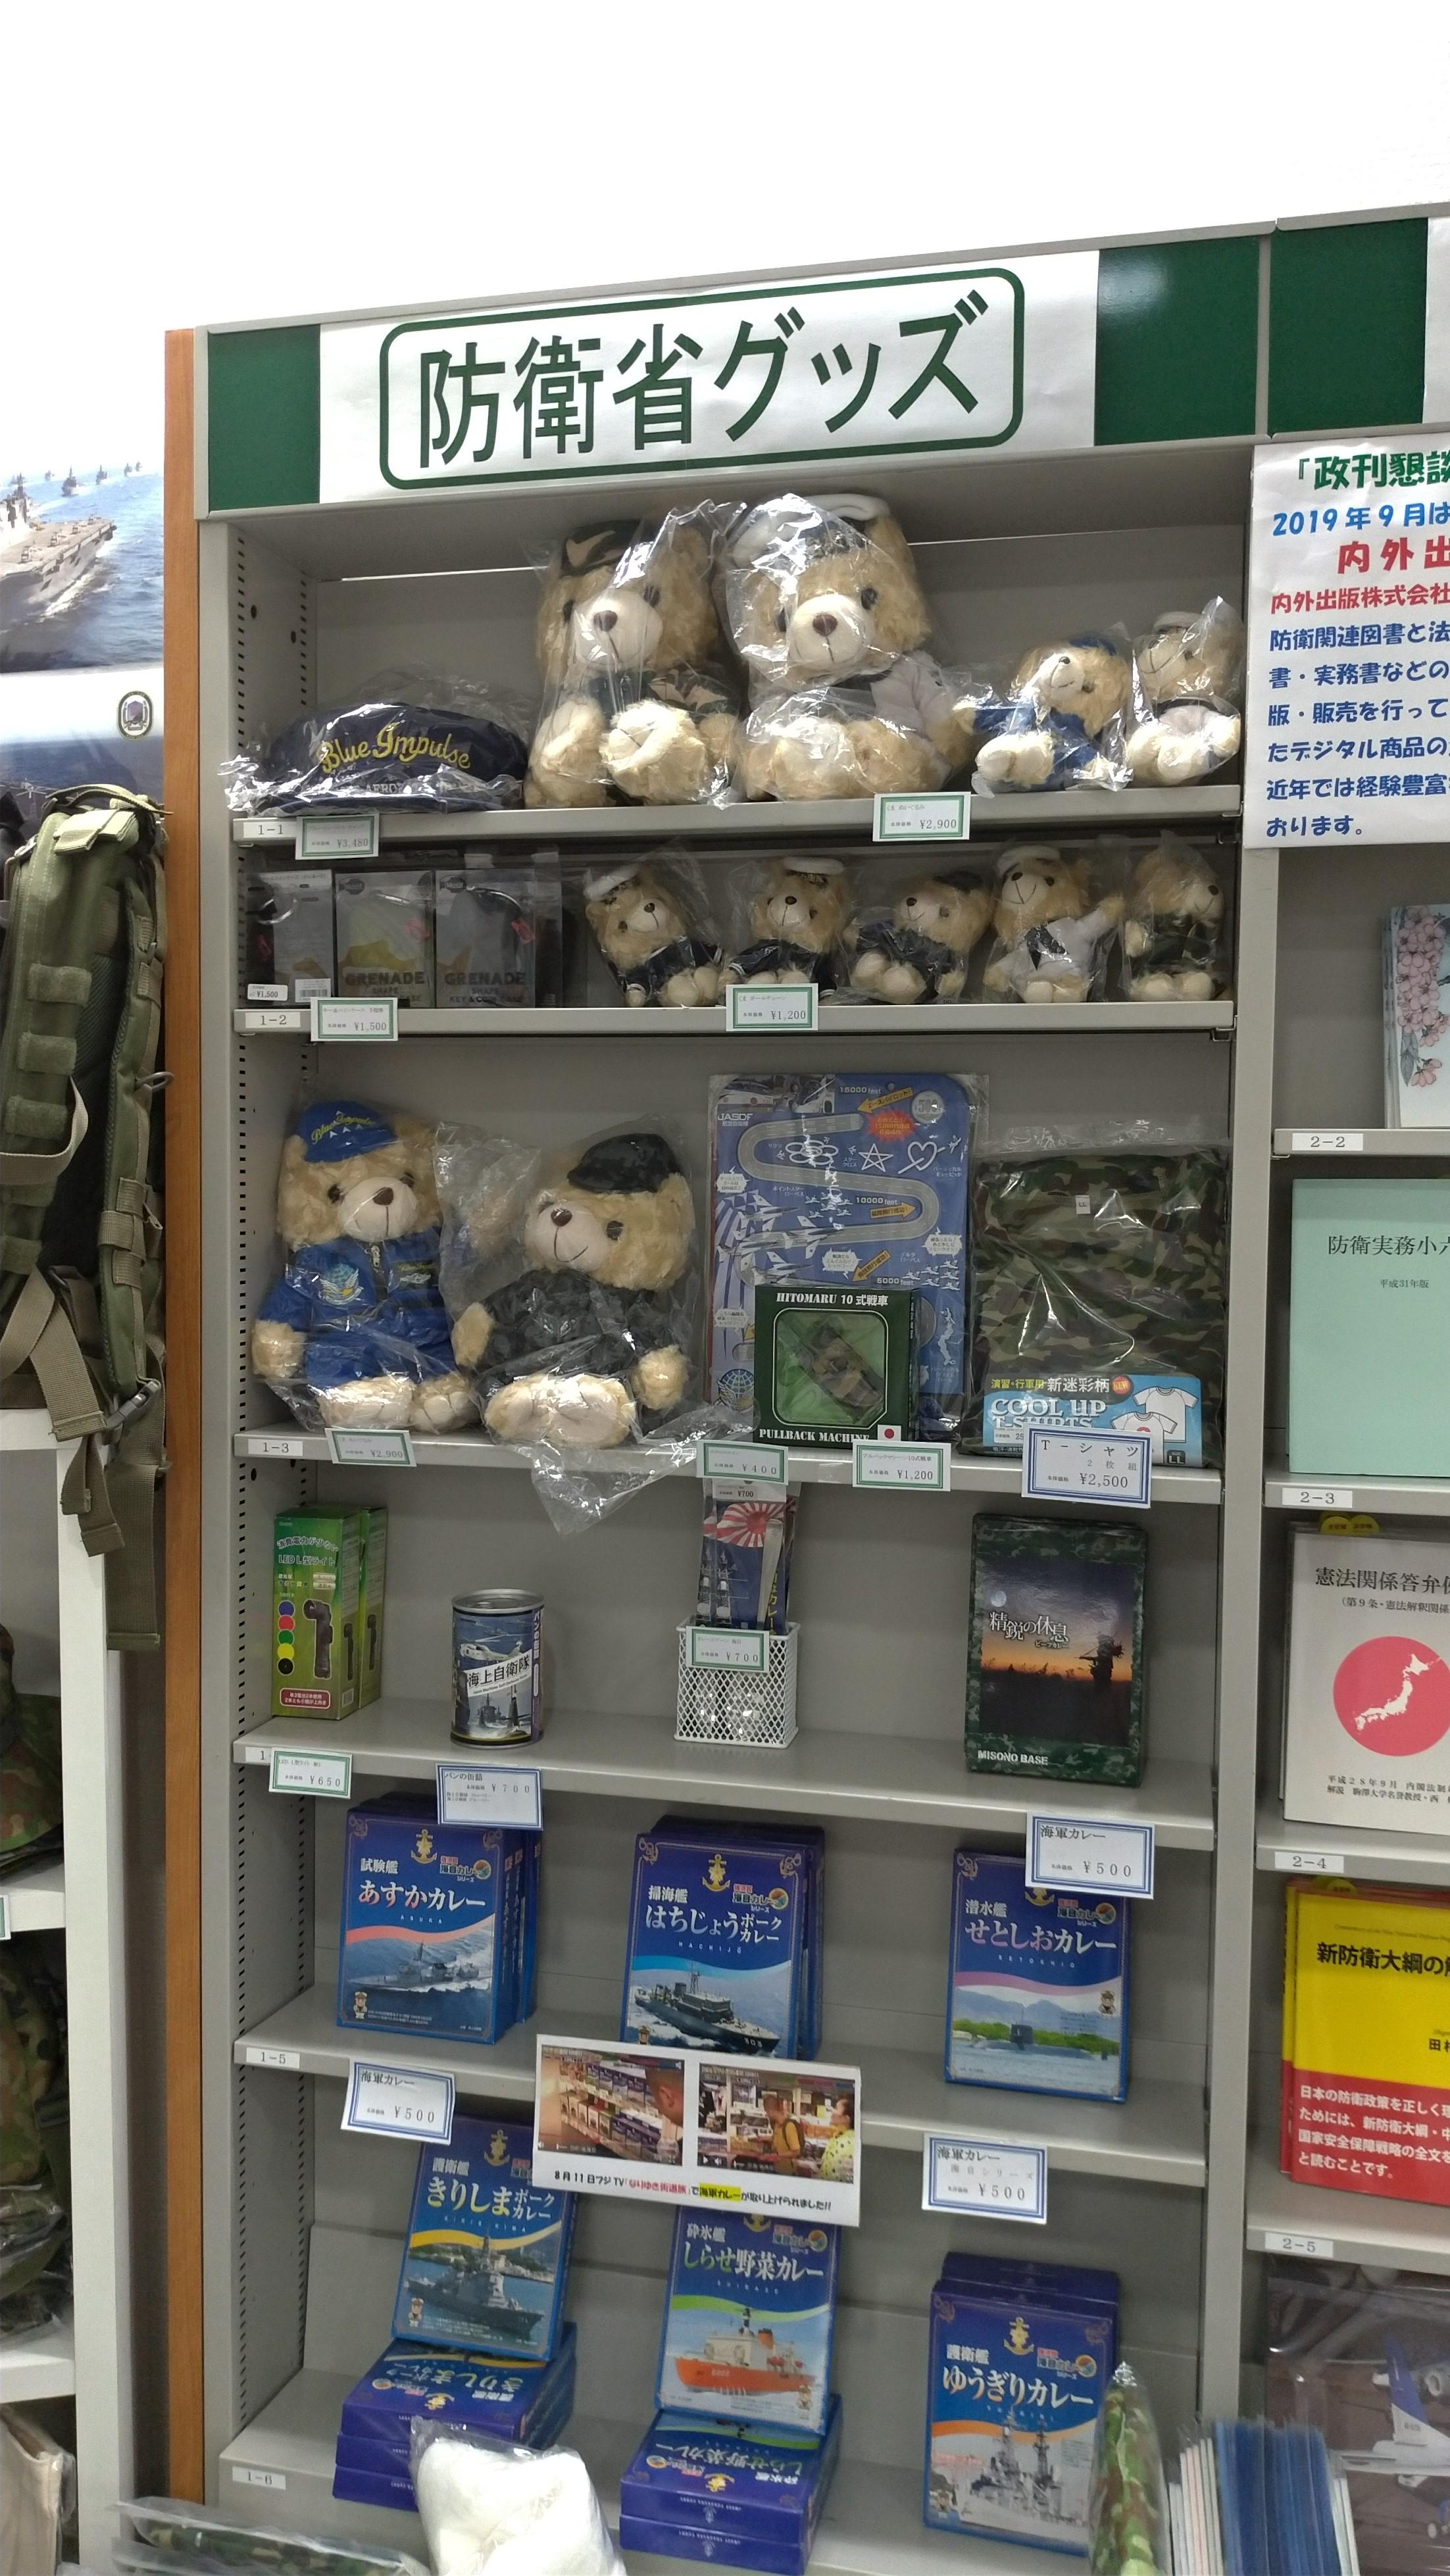 http://www.naigai-group.co.jp/ichigaya/books-img/P_20190911_131909_vHDR_Auto.jpg